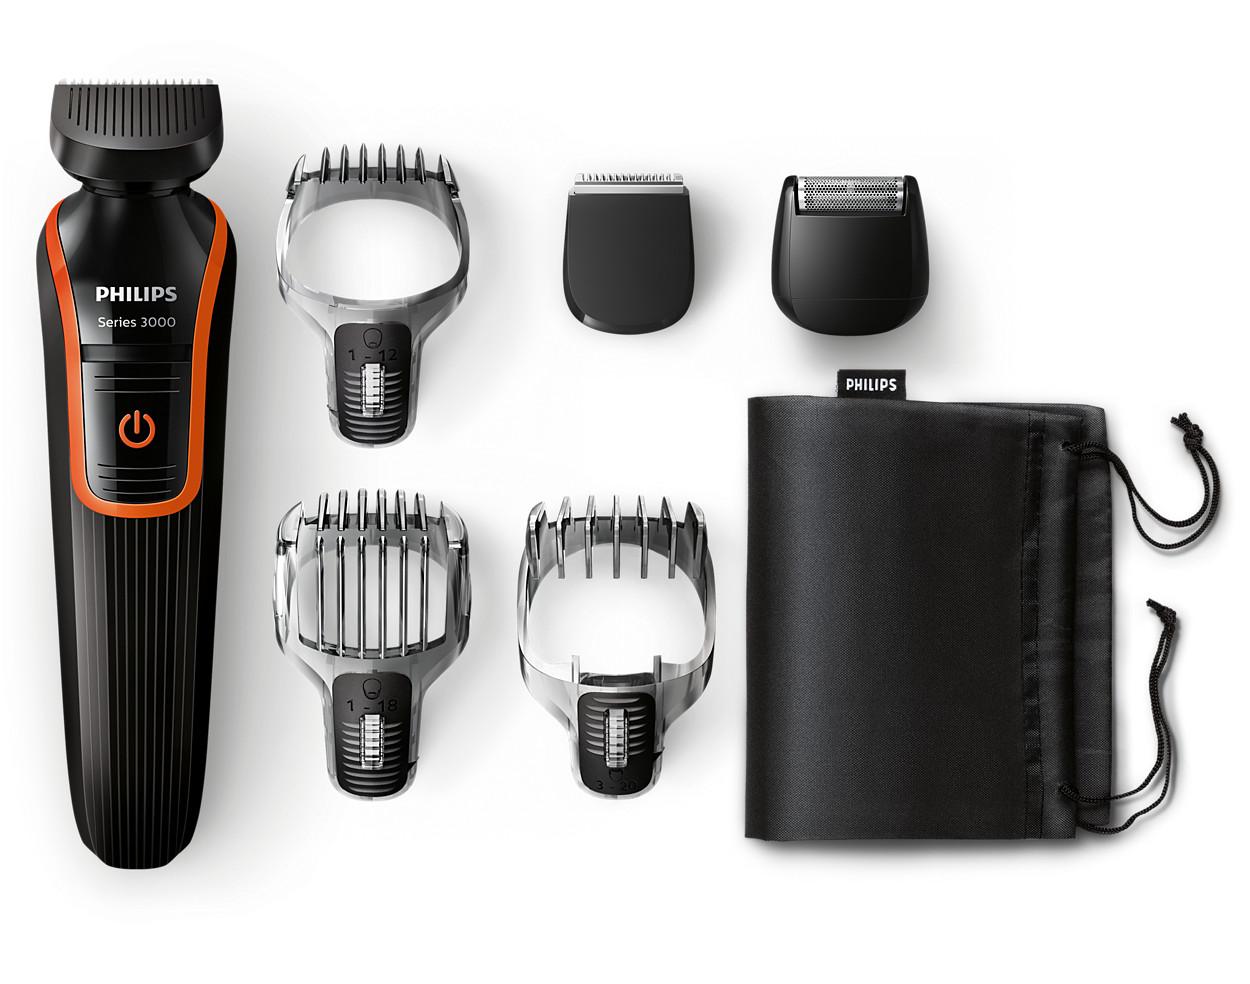 multigroom series 5000 grooming kit qg3347 15 philips. Black Bedroom Furniture Sets. Home Design Ideas